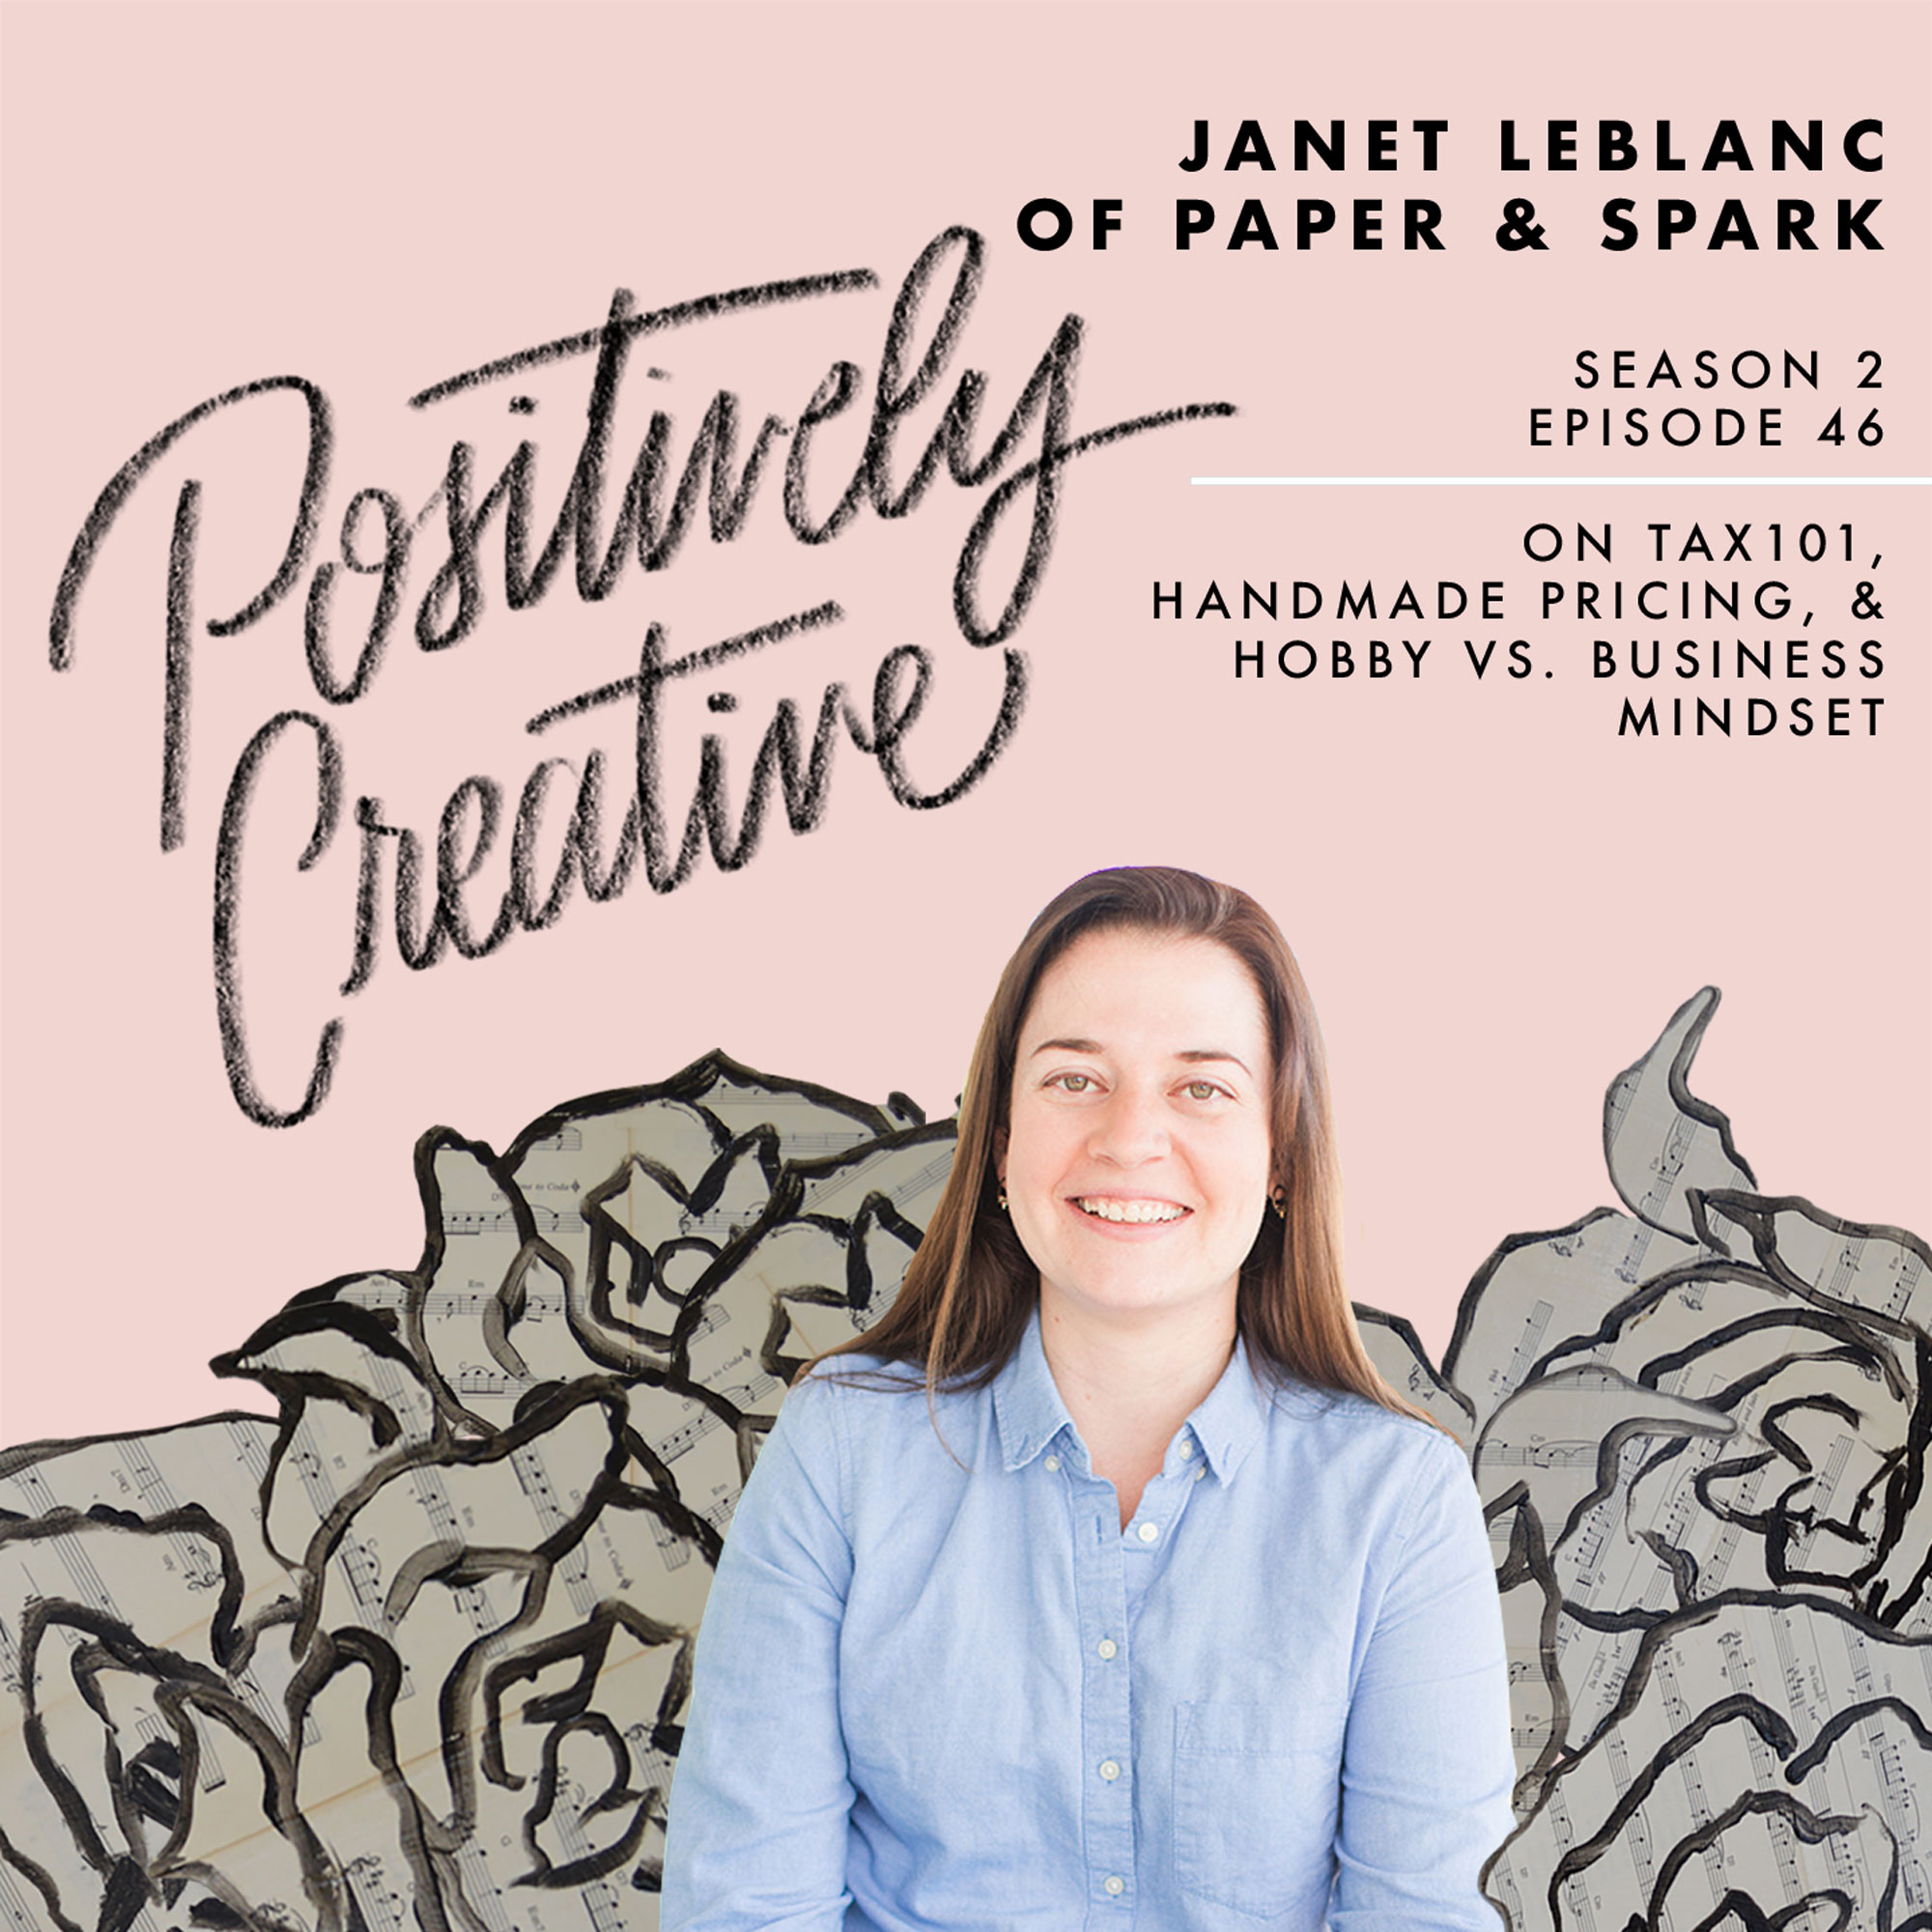 Artwork for 046 - Janet LeBlanc of Paper & Spark on Tax101, Handmade Pricing, & Hobby vs. Business Mindset